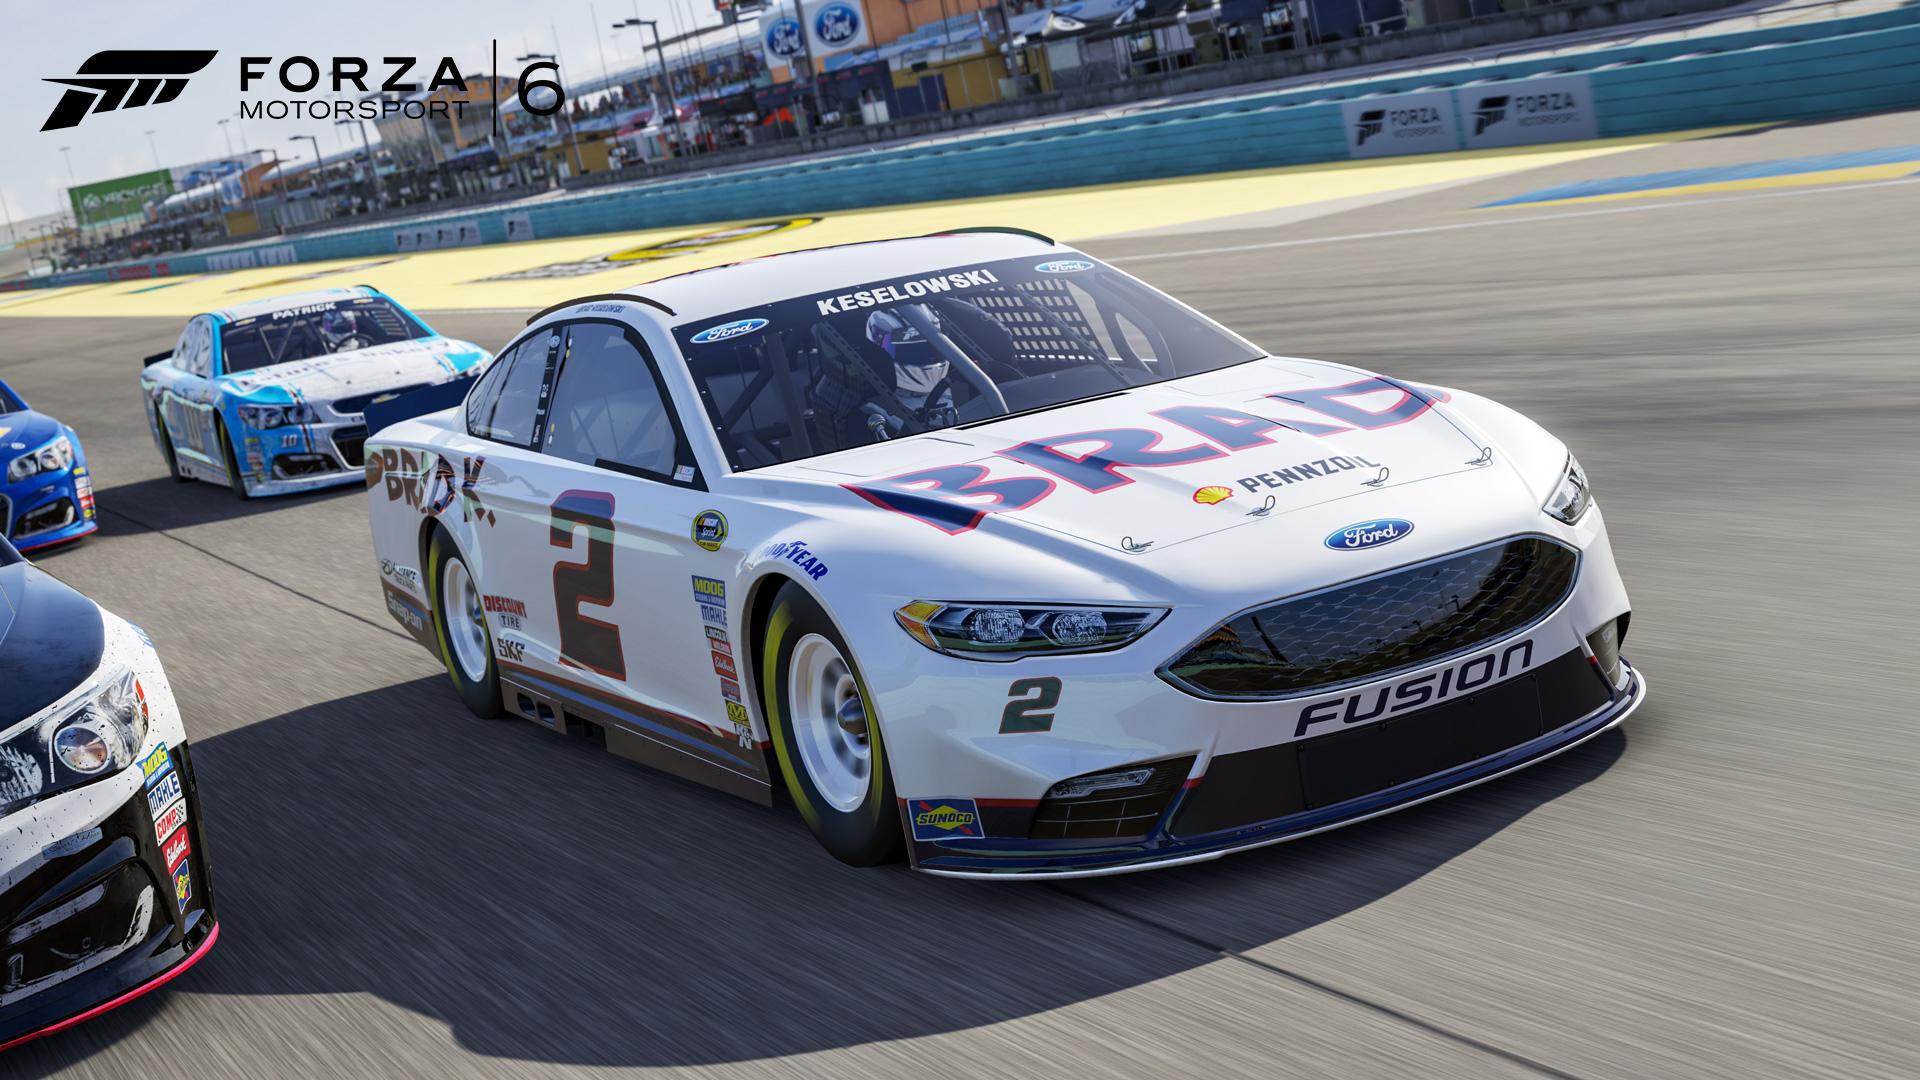 Penske Race Cars For Sale